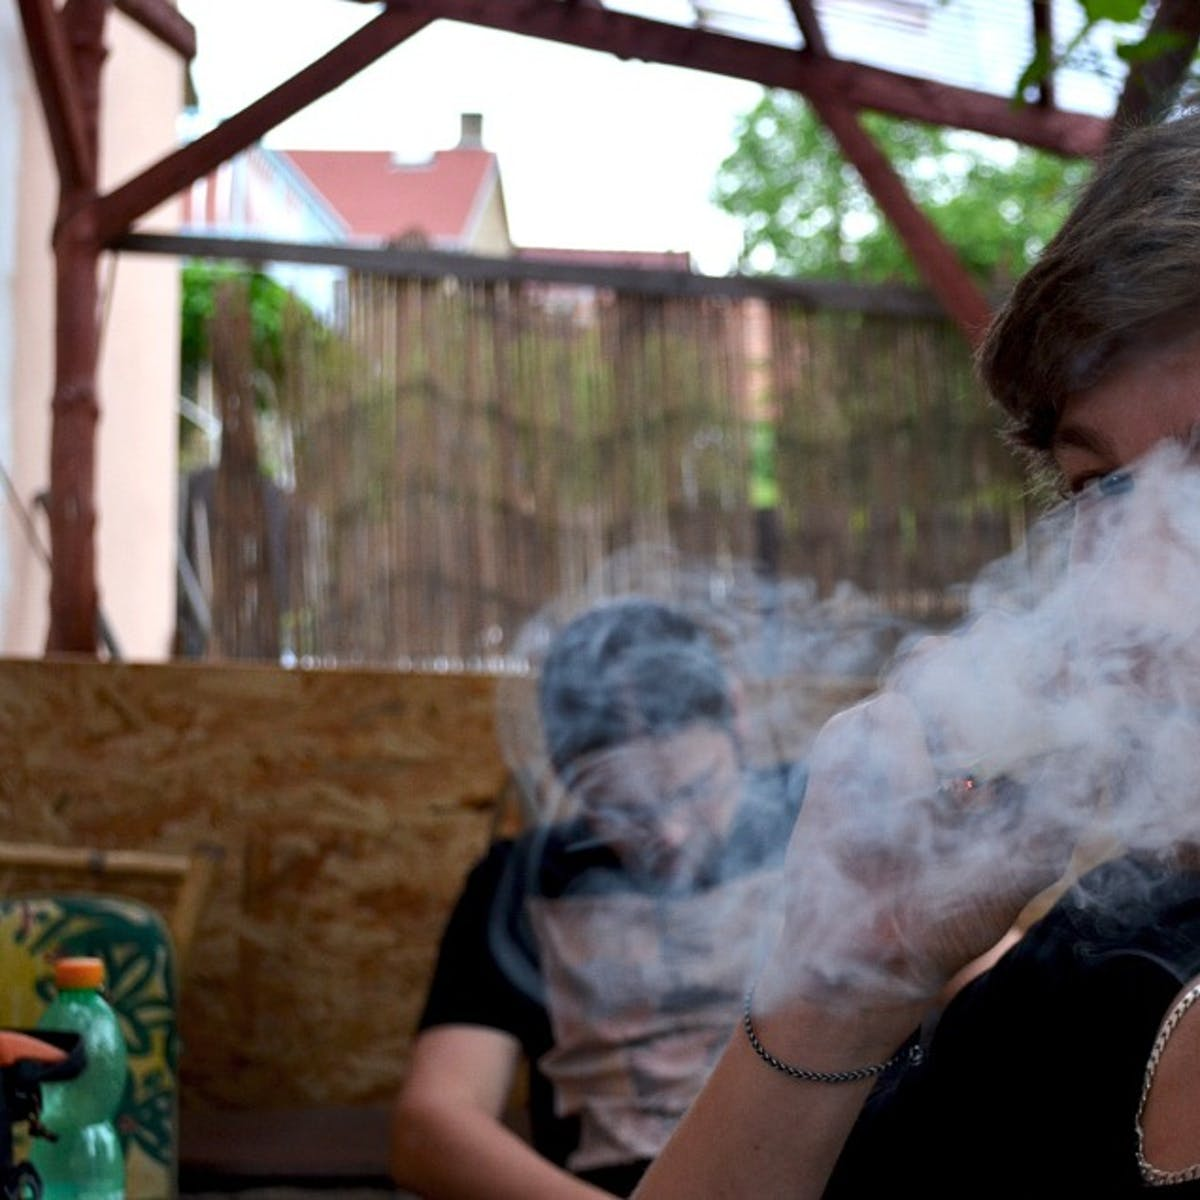 Marijuana: New Study Links Smoking 'Potent' High-THC Cannabis and Psychosis